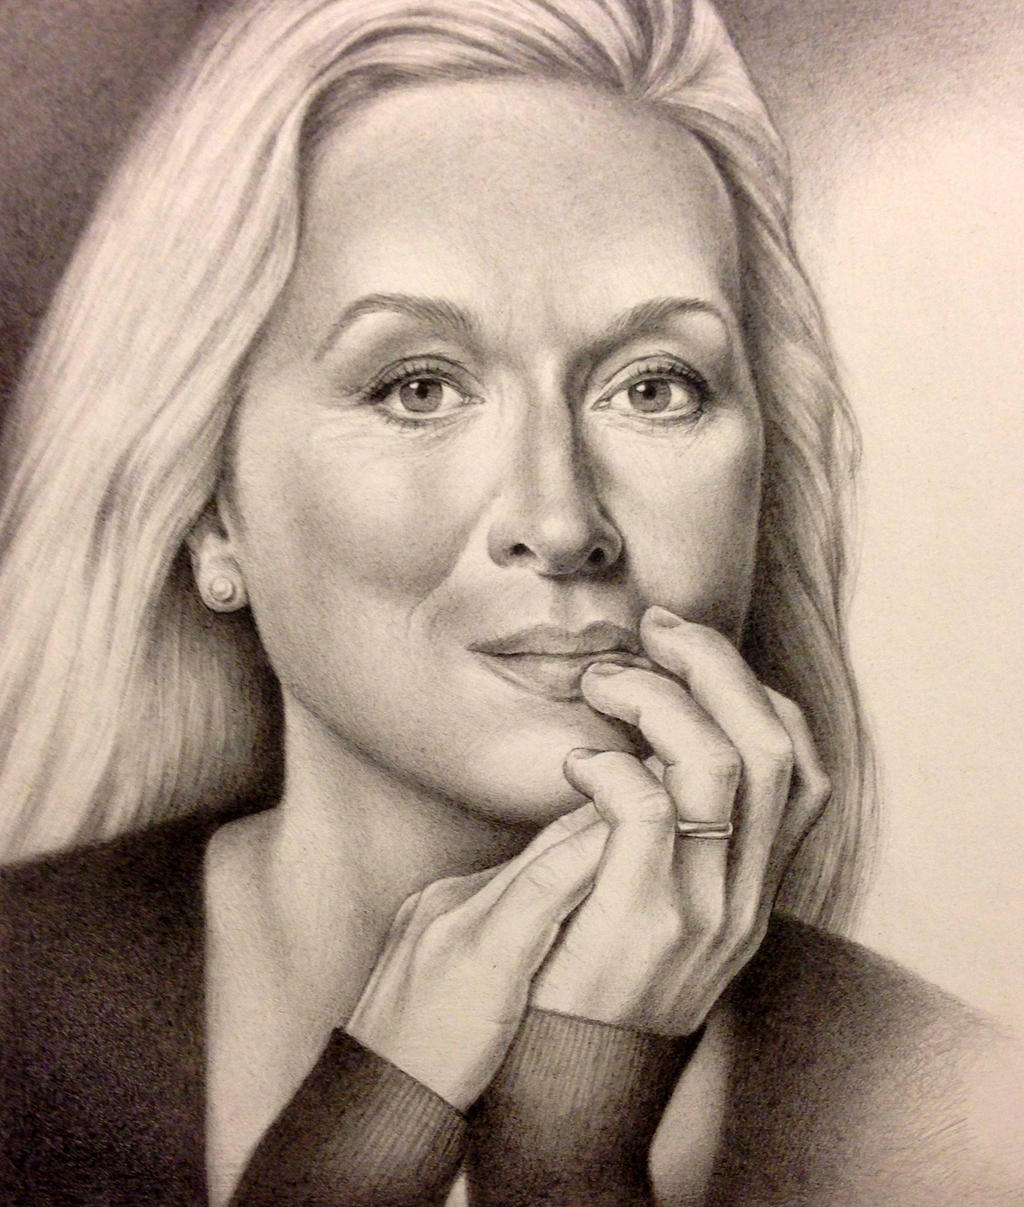 Meryl Streep by southampton11968